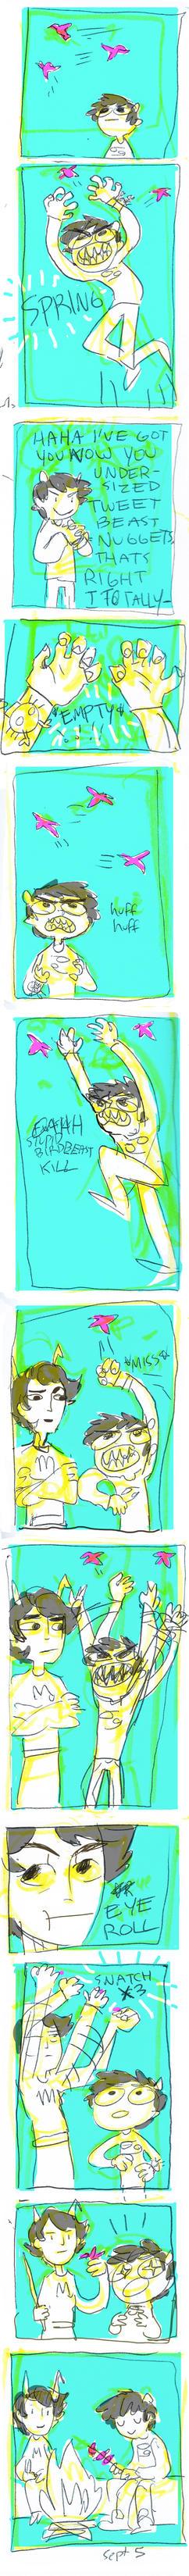 Stupidbirds by DefineTheSky